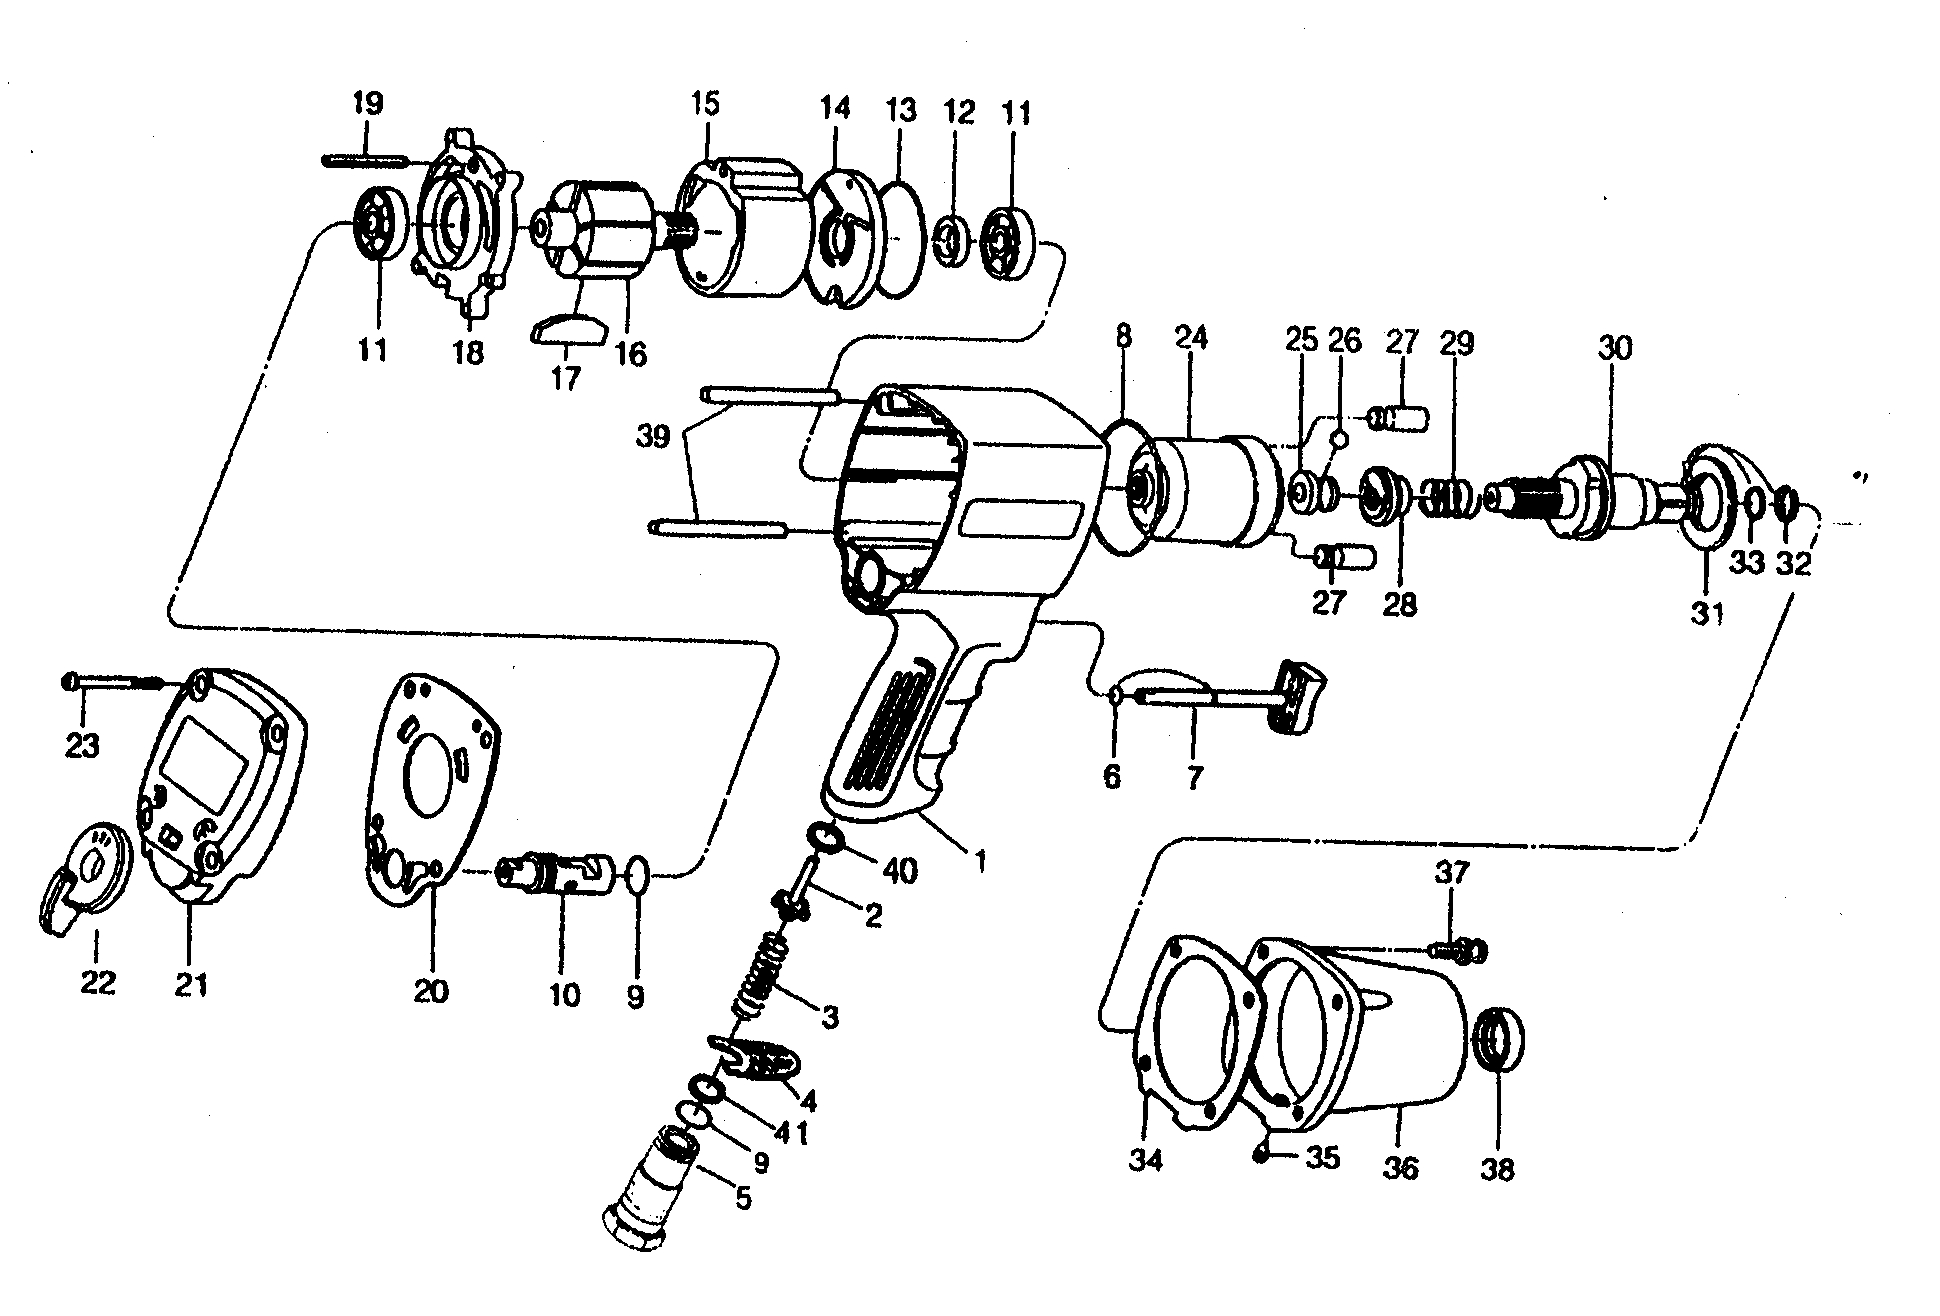 Air Tool: Ingersoll Rand Air Tool Parts Diagrams